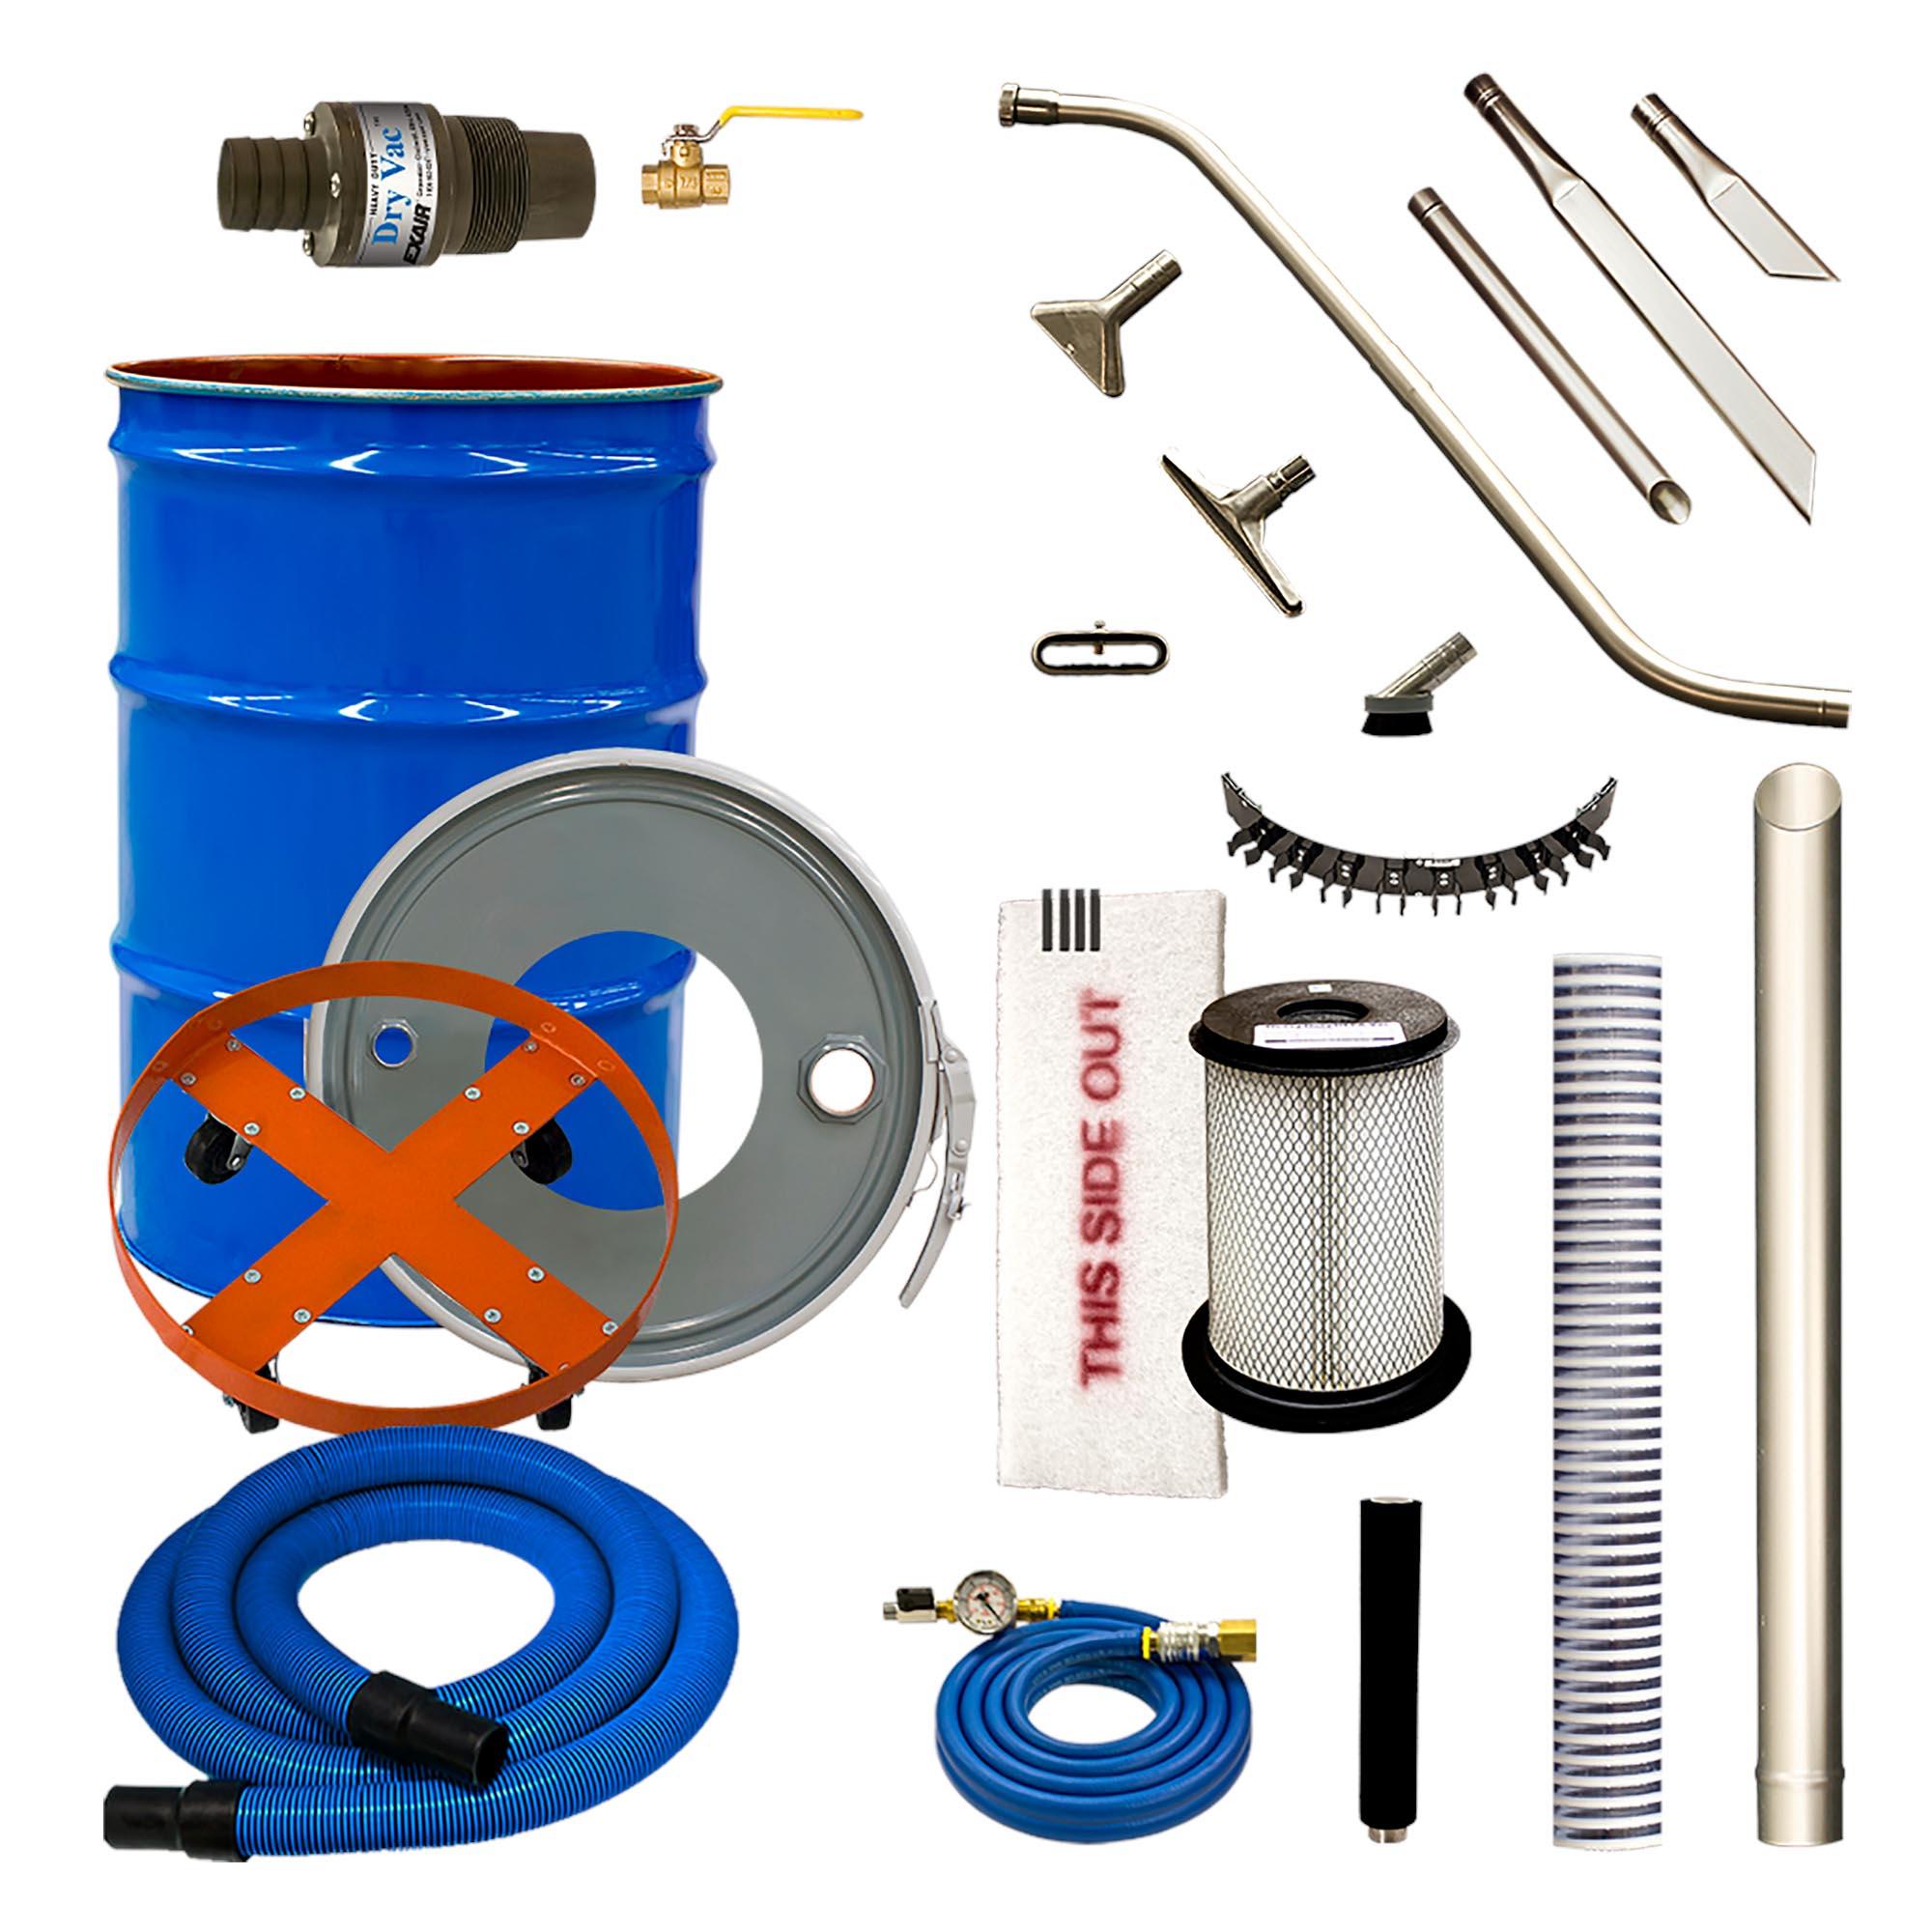 Model 6399-30 30 Gallon Premium Heavy Duty HEPA Vac System